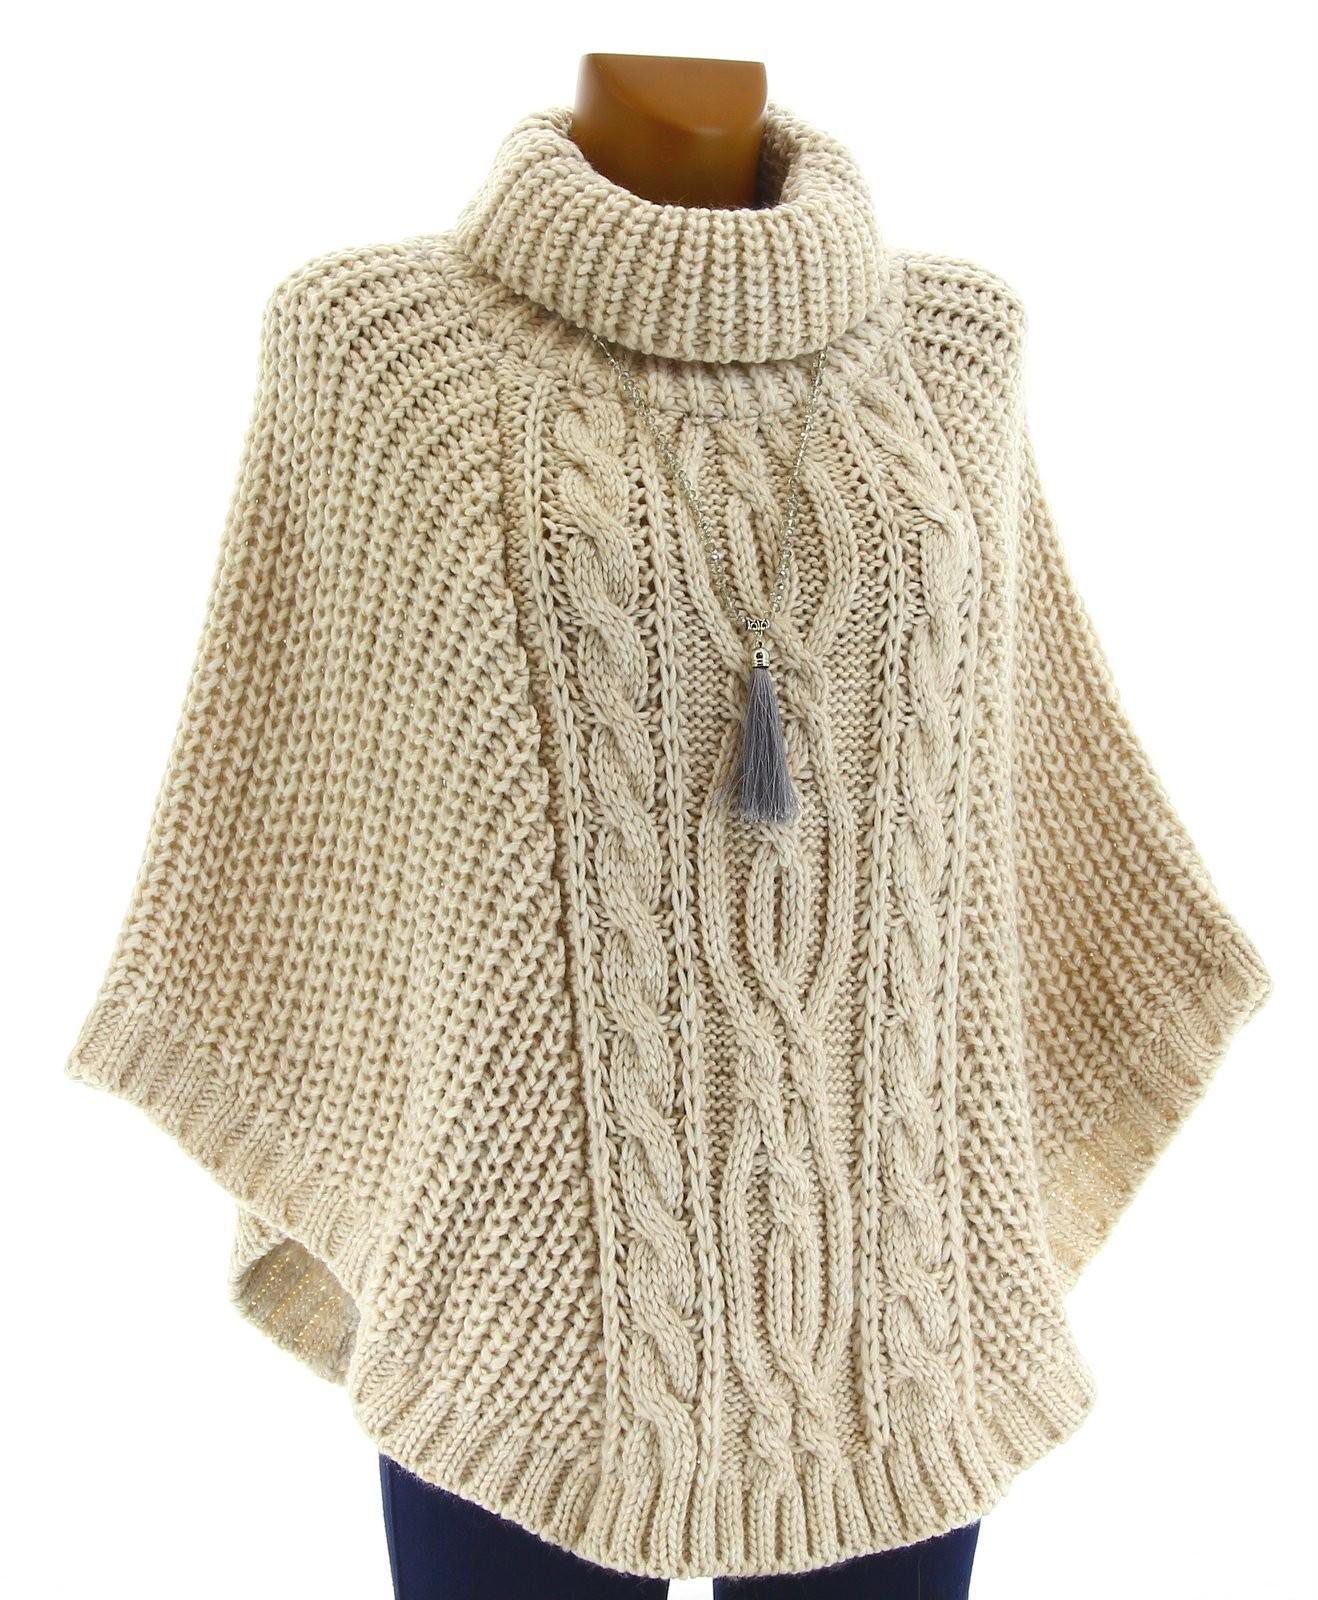 maille de laine great leon u harper pull ample grosse maille laine et mohair monterrey jaune. Black Bedroom Furniture Sets. Home Design Ideas